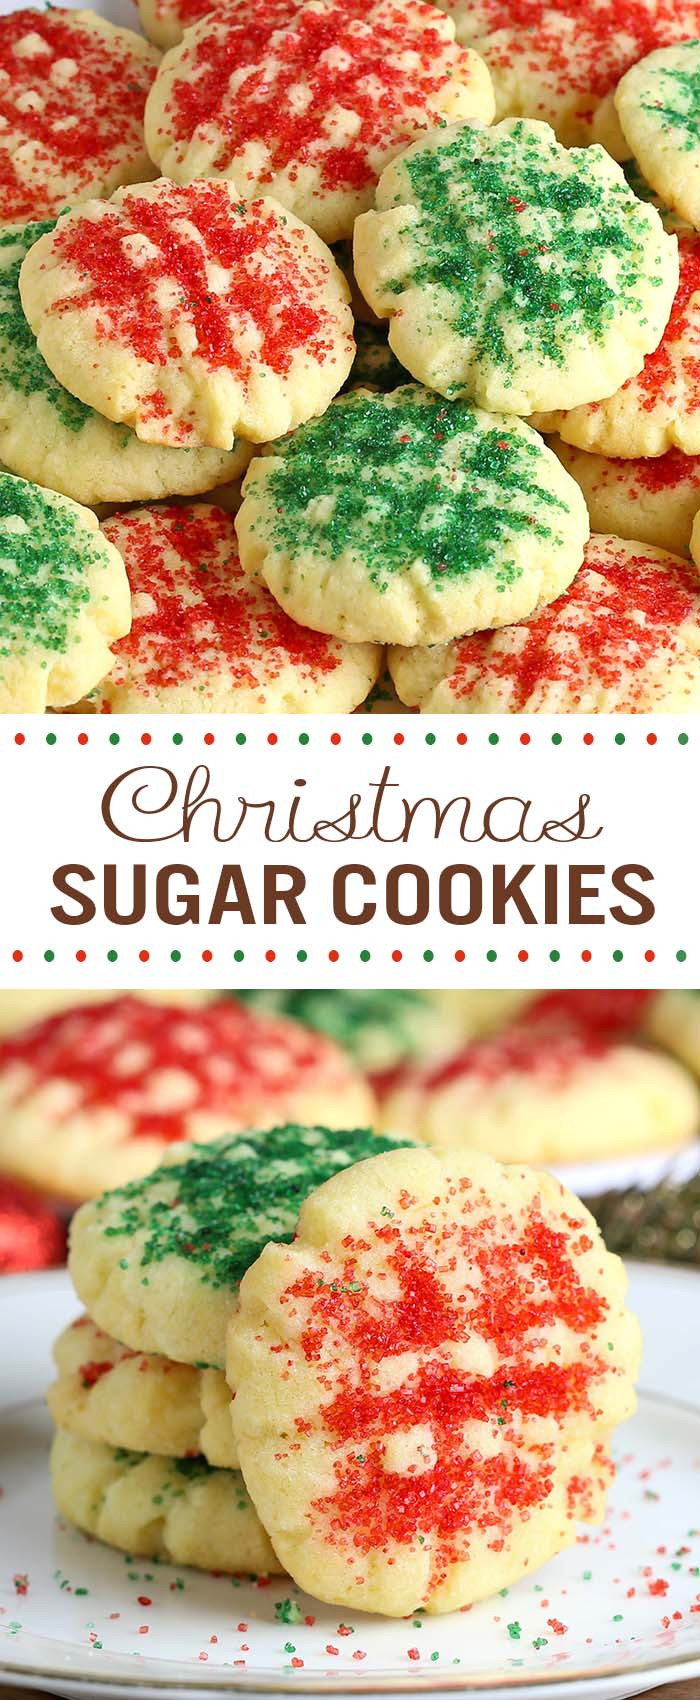 Christmas Sugar Cookies Recipe  Christmas Sugar Cookies Cakescottage